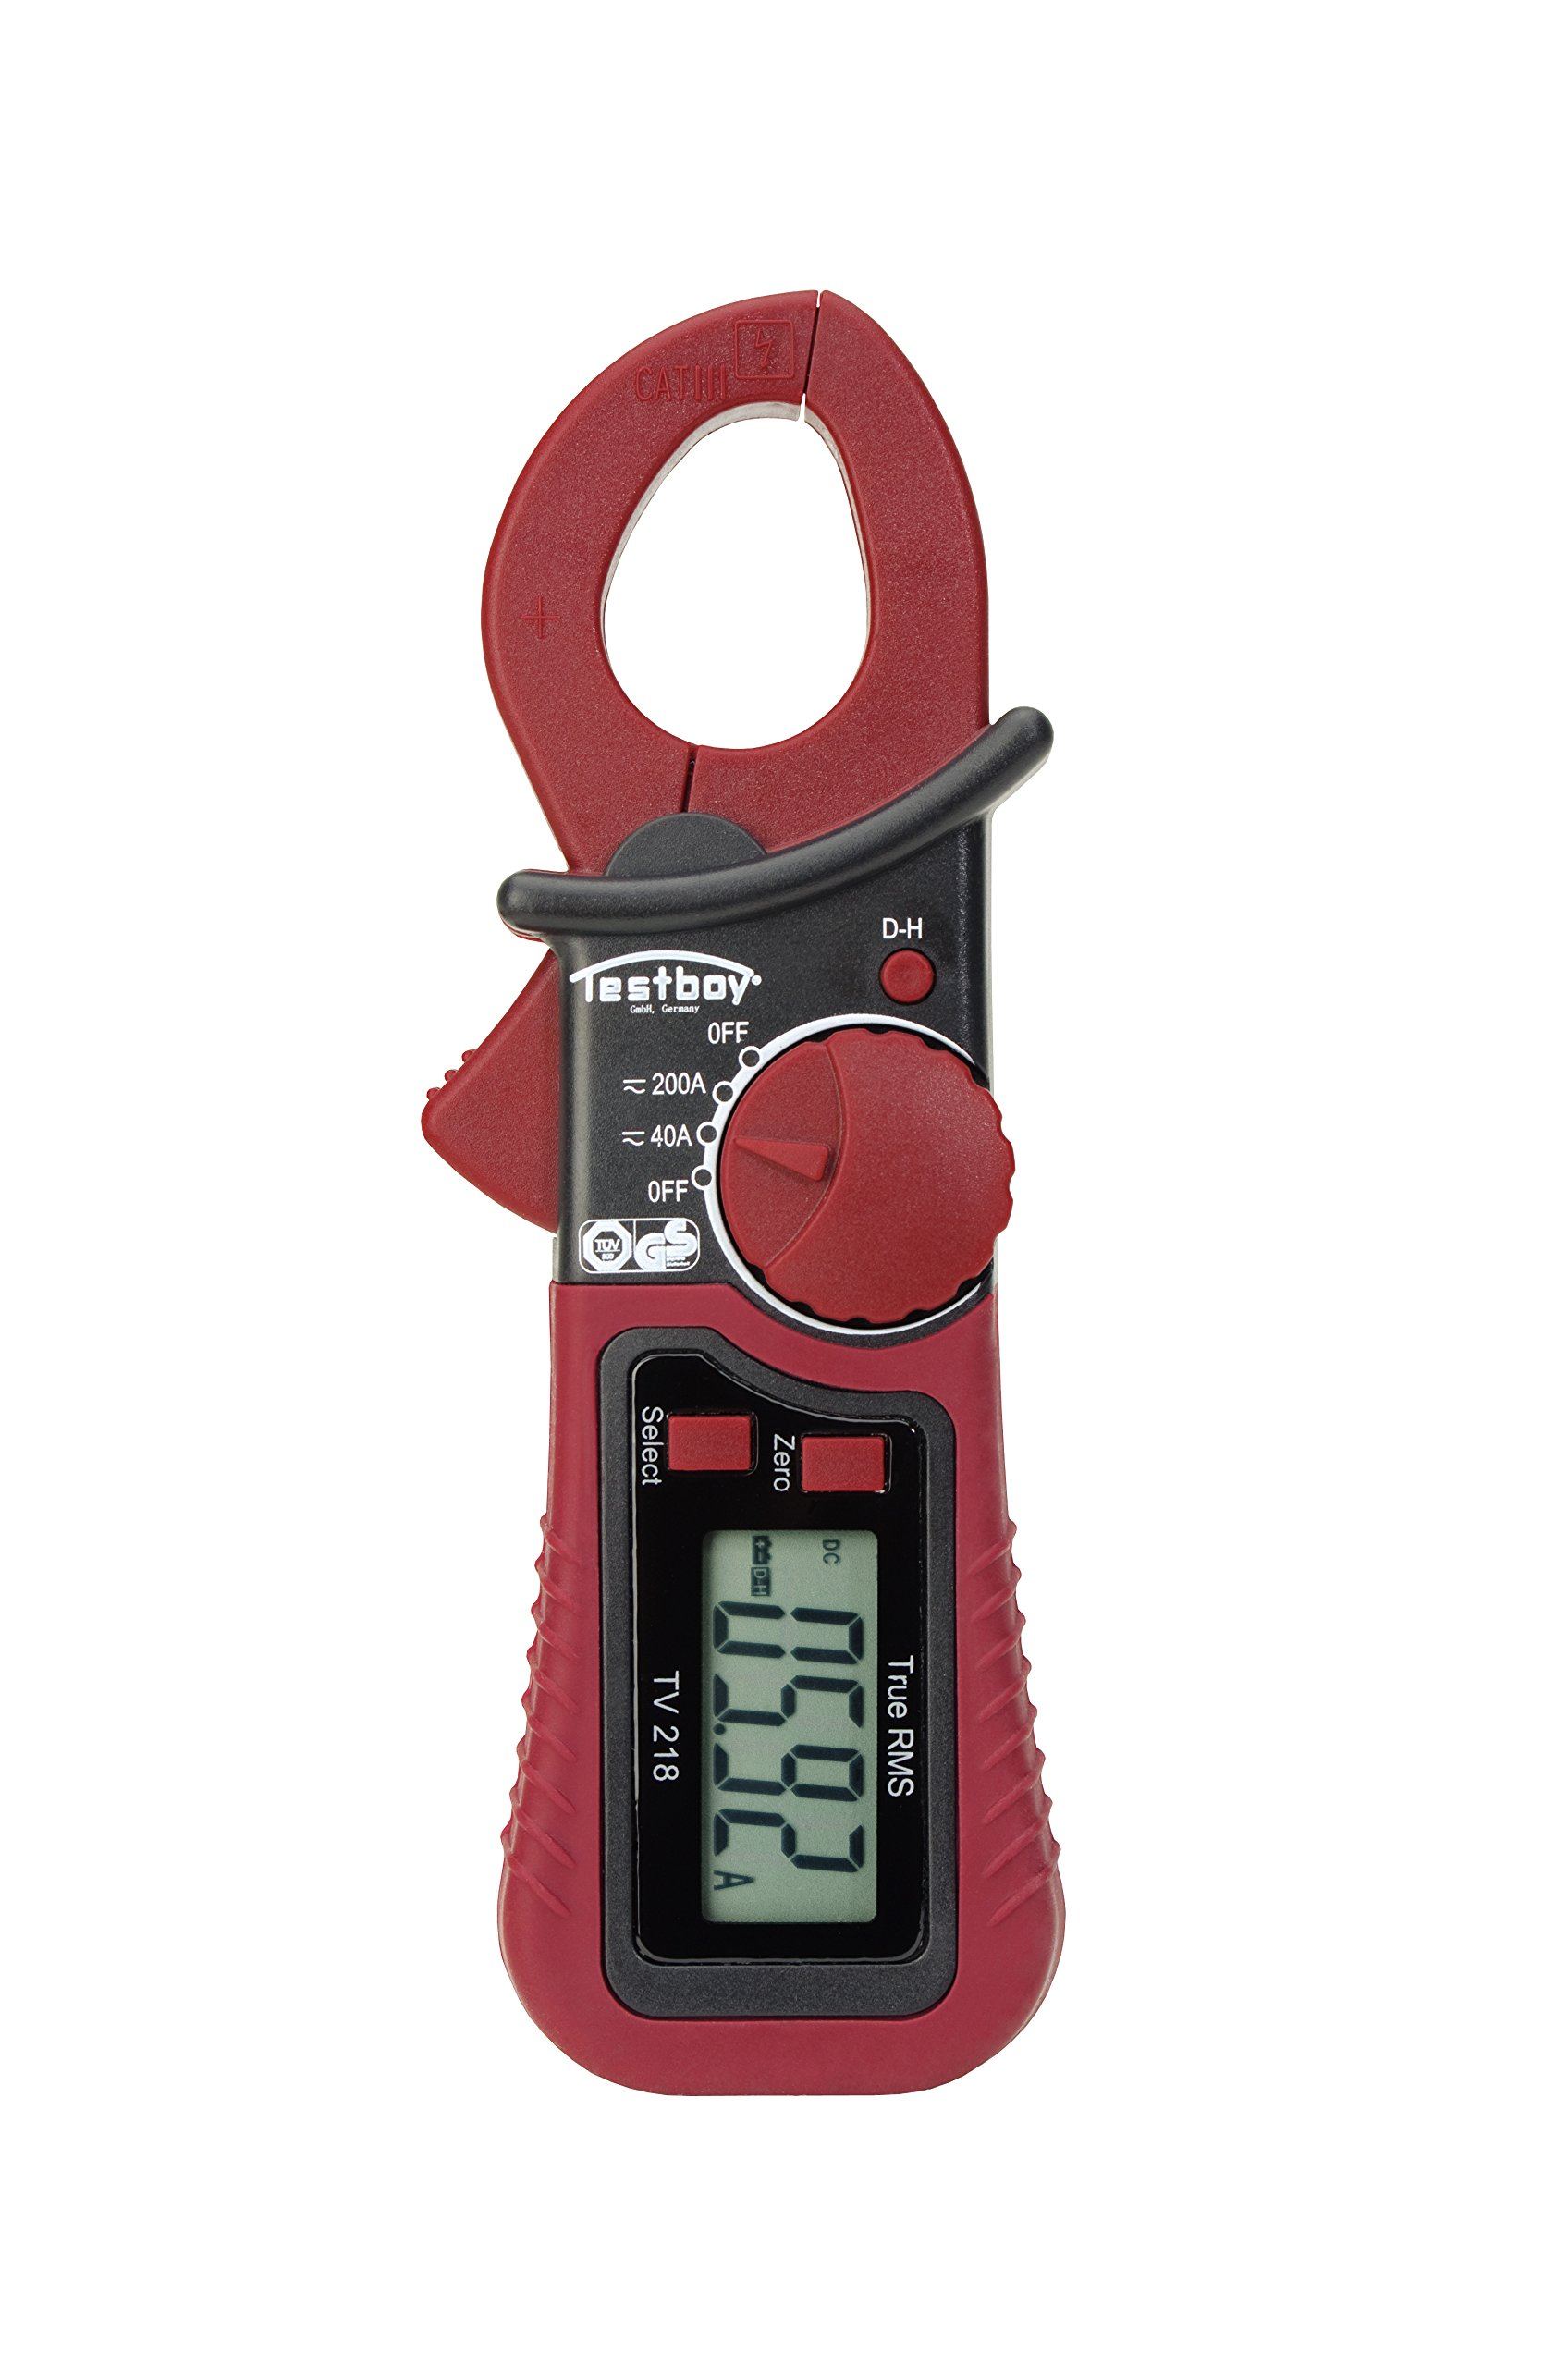 Testboy Testboy TV 218 Digitales Miniatur-Zangenparameter Testboy TV 218, inklusive Tasche product image